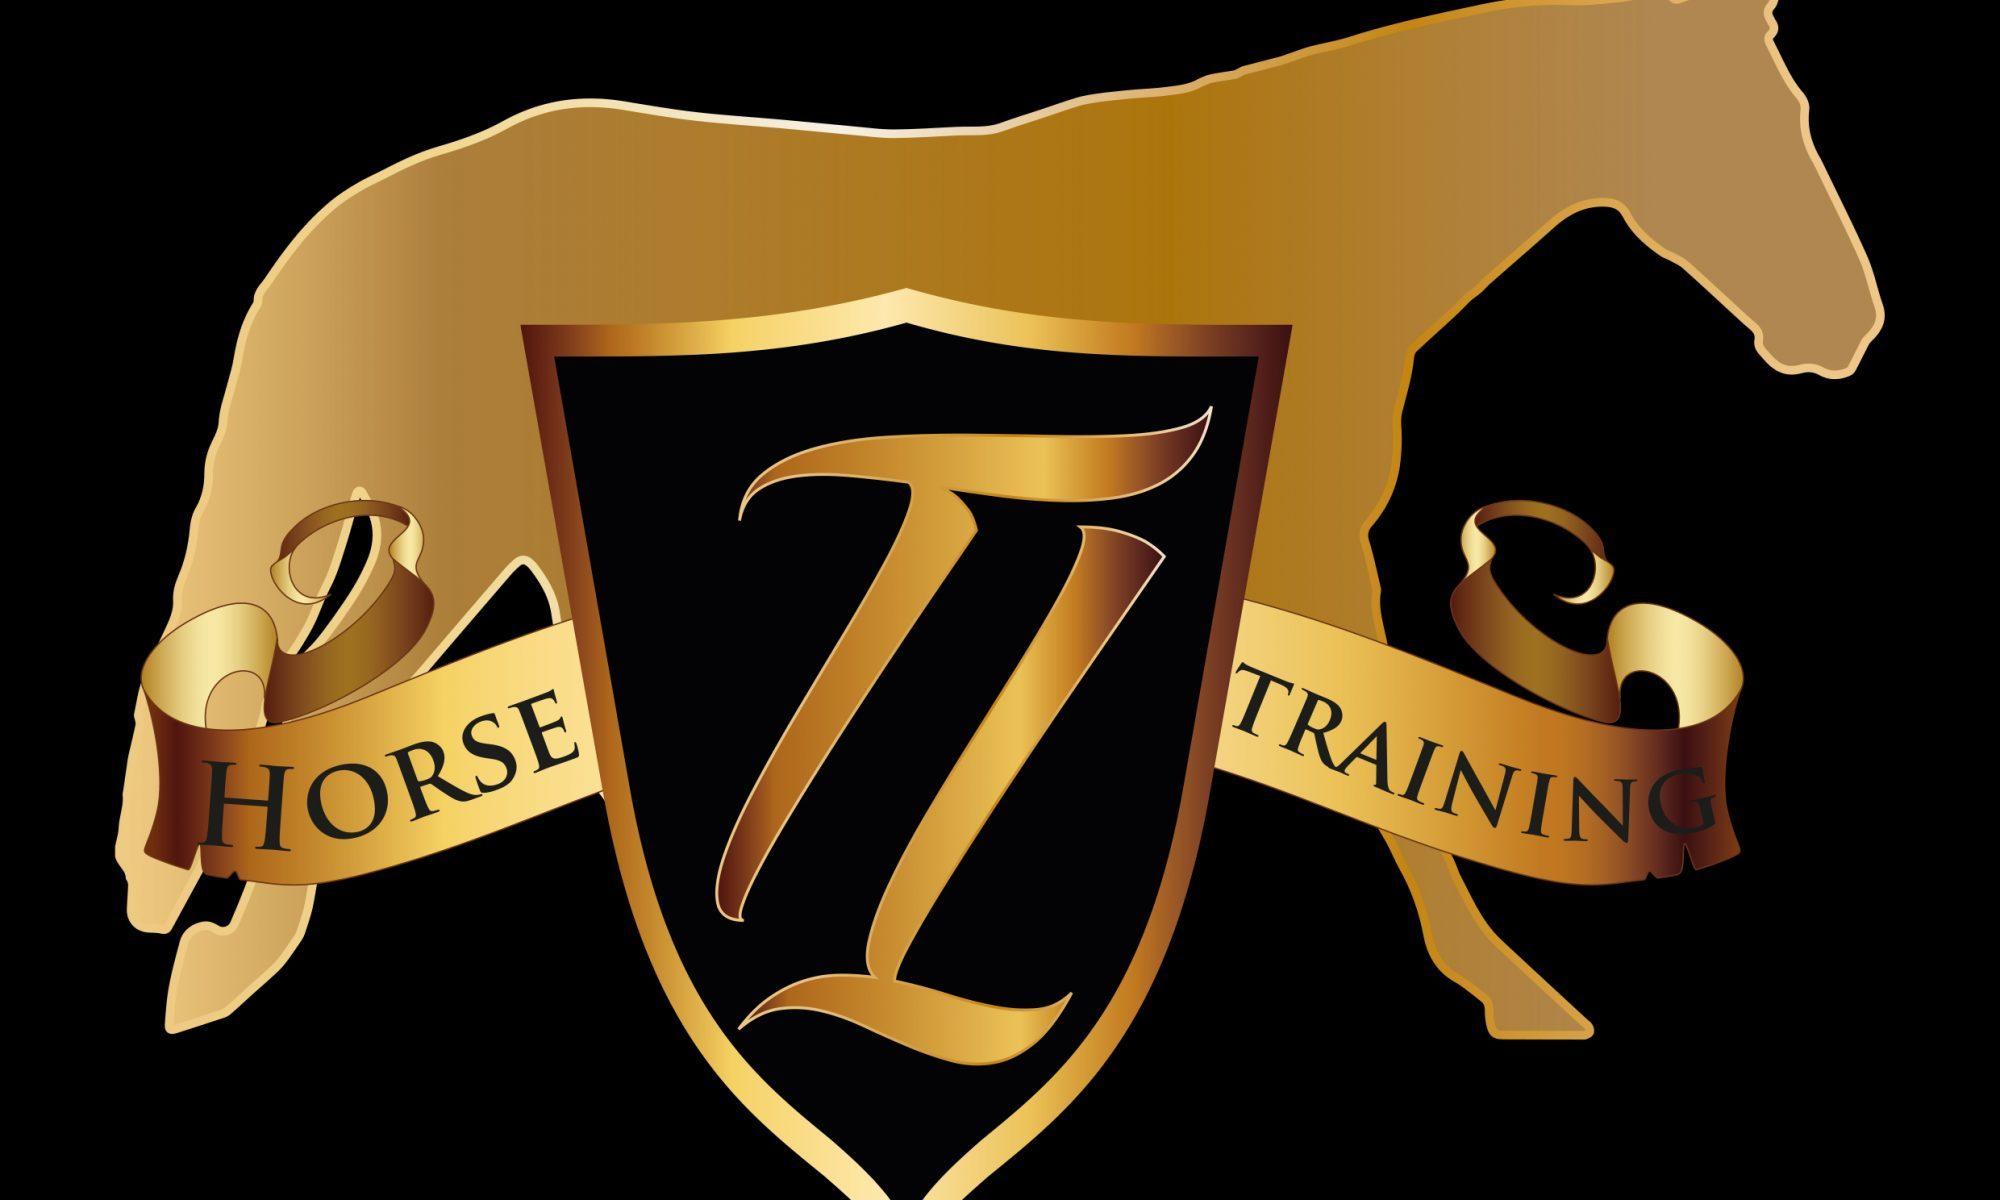 TL Horsetraining